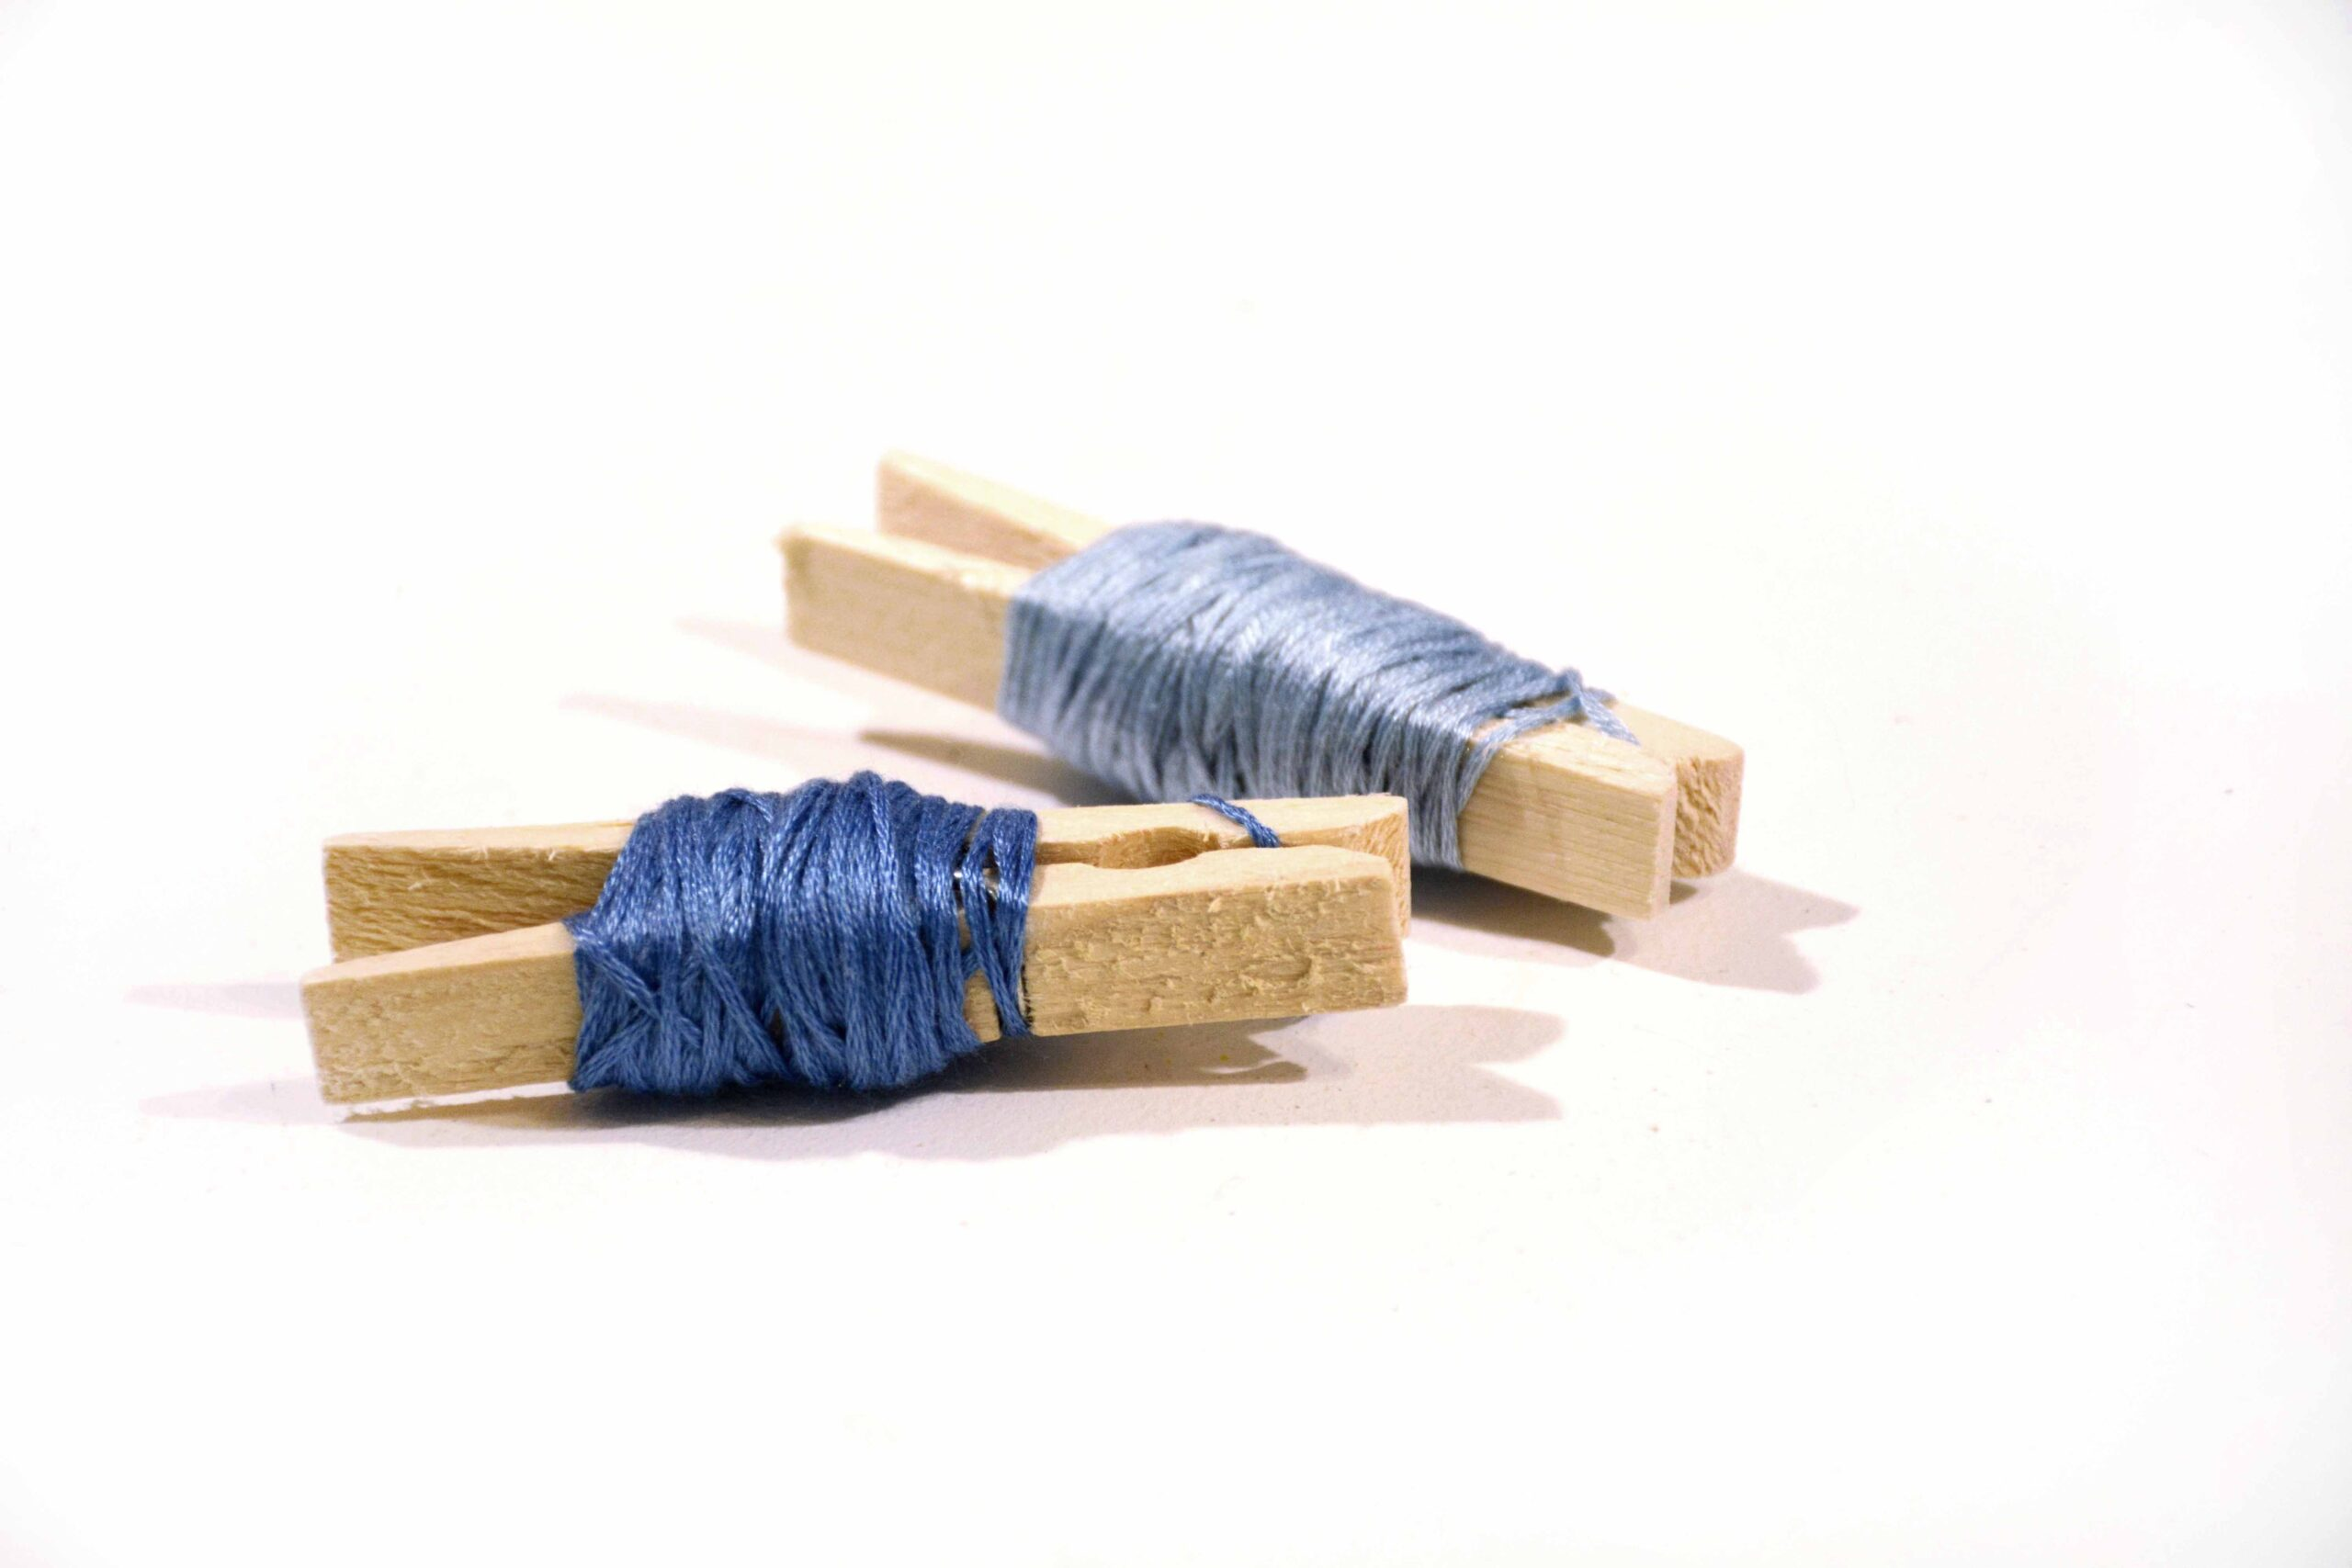 324: Trådlöst (70/365)